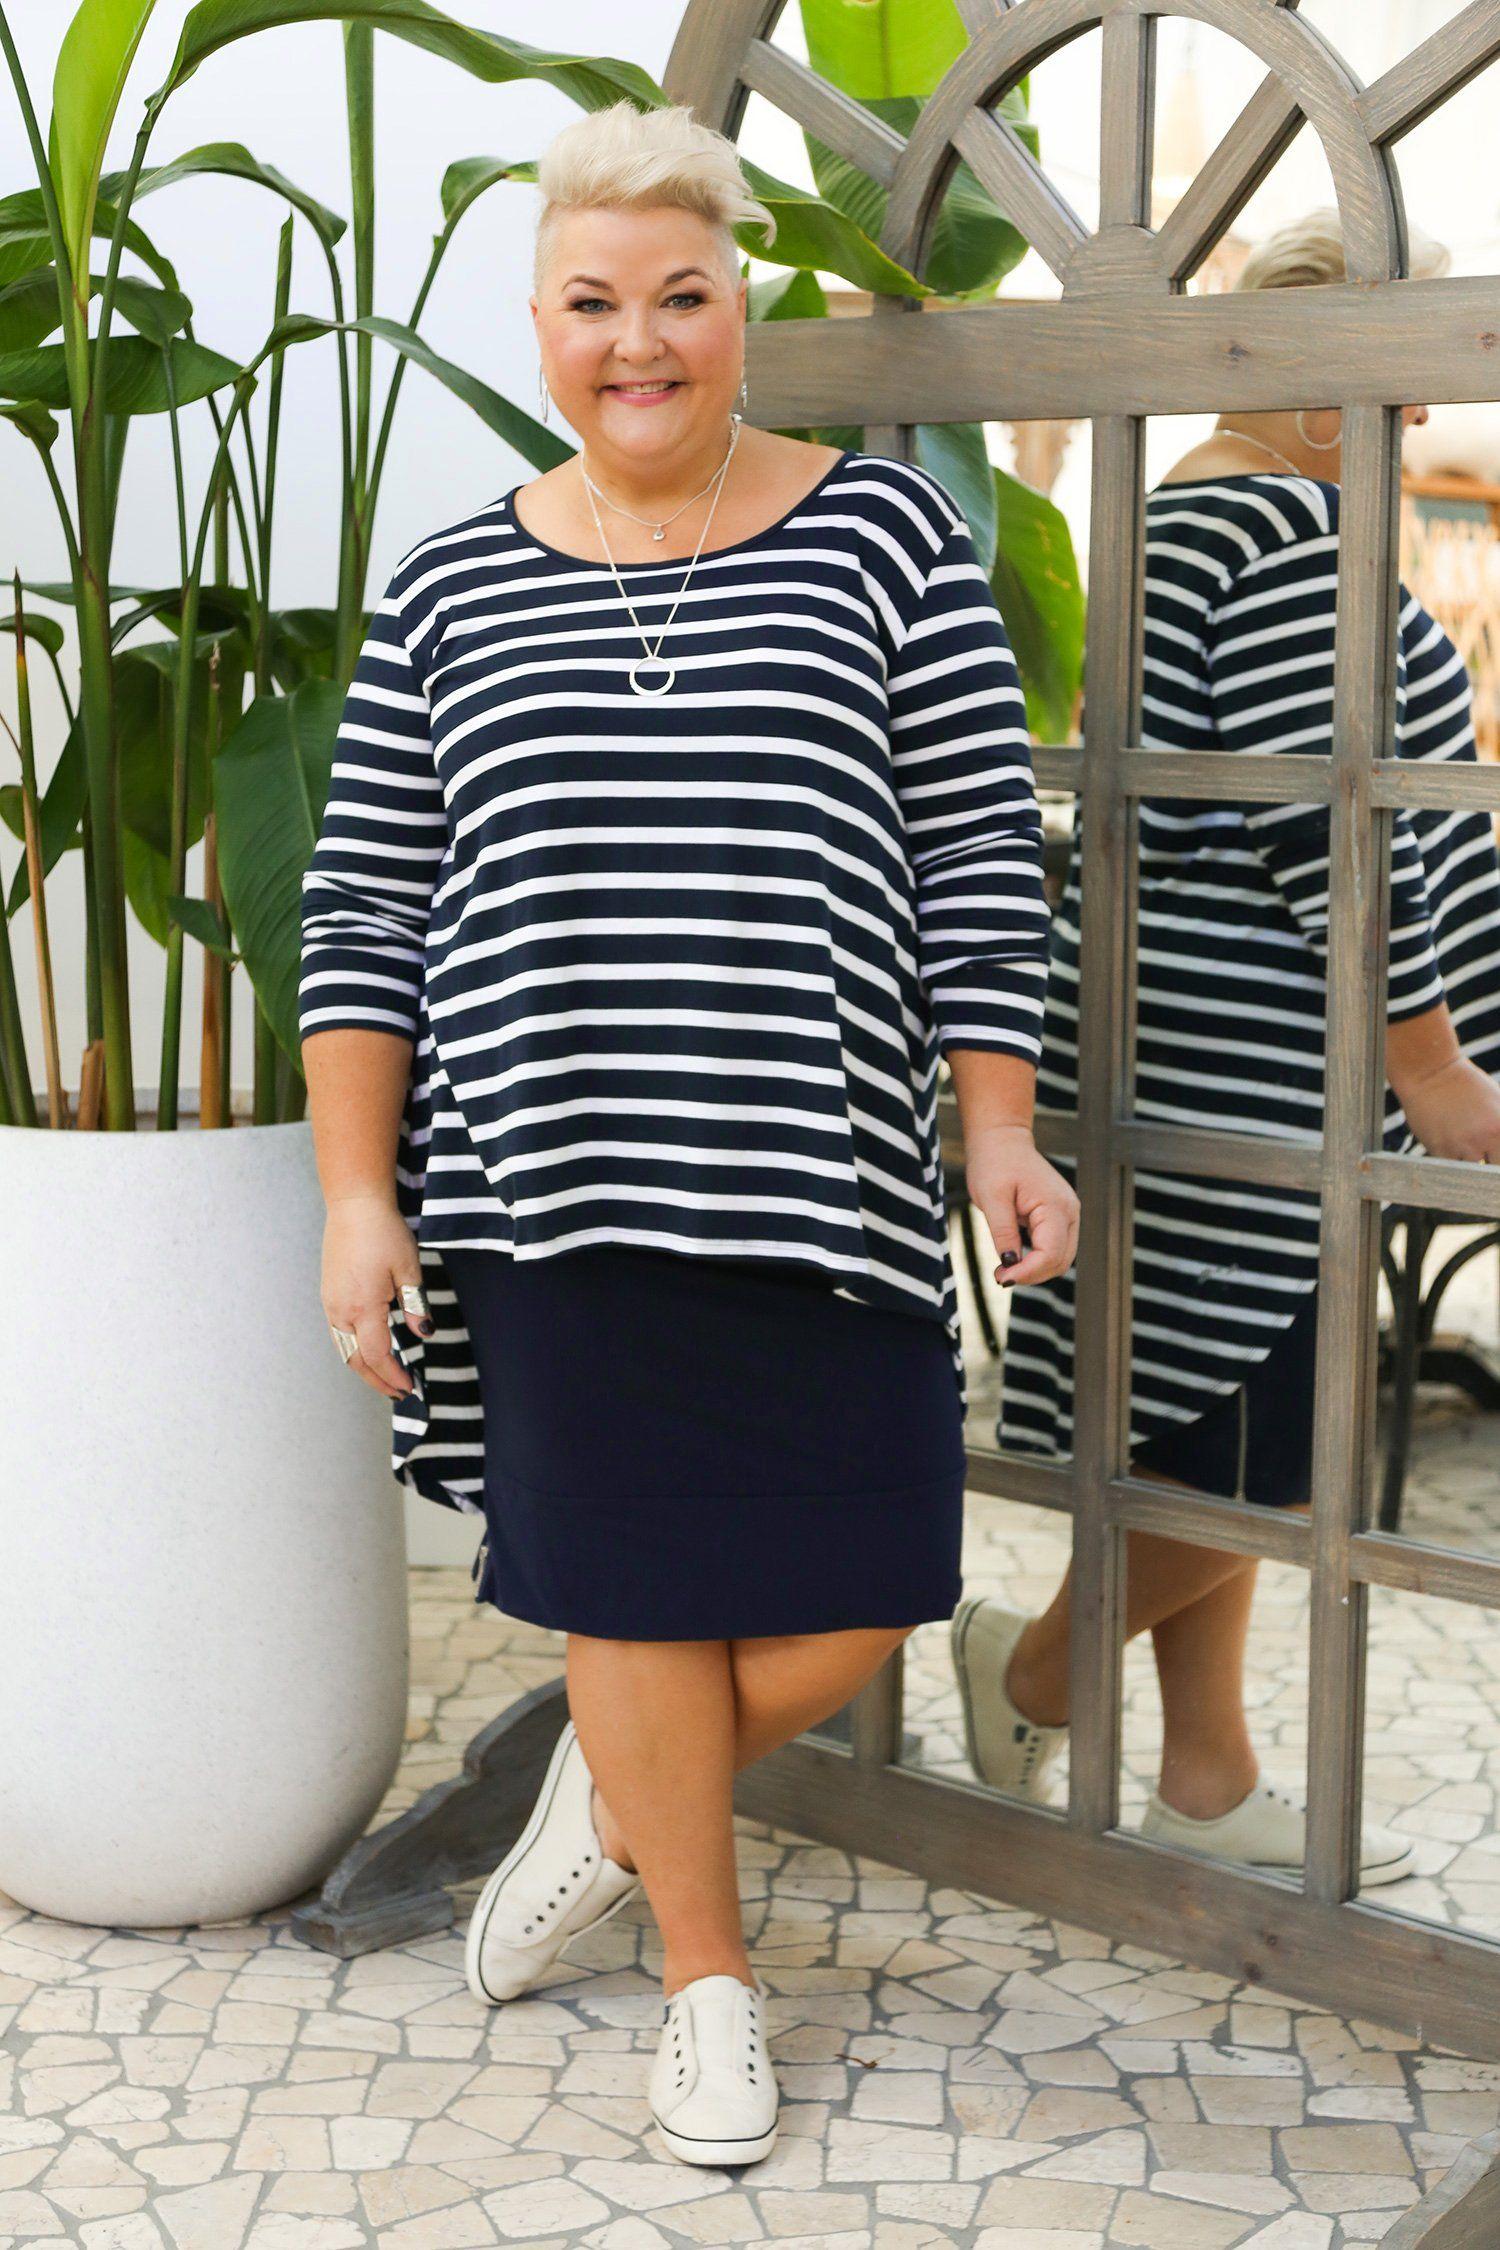 dc58d8d7097 Adrift Women s Plus Size Mila Skirt in Navy - 100% Cotton